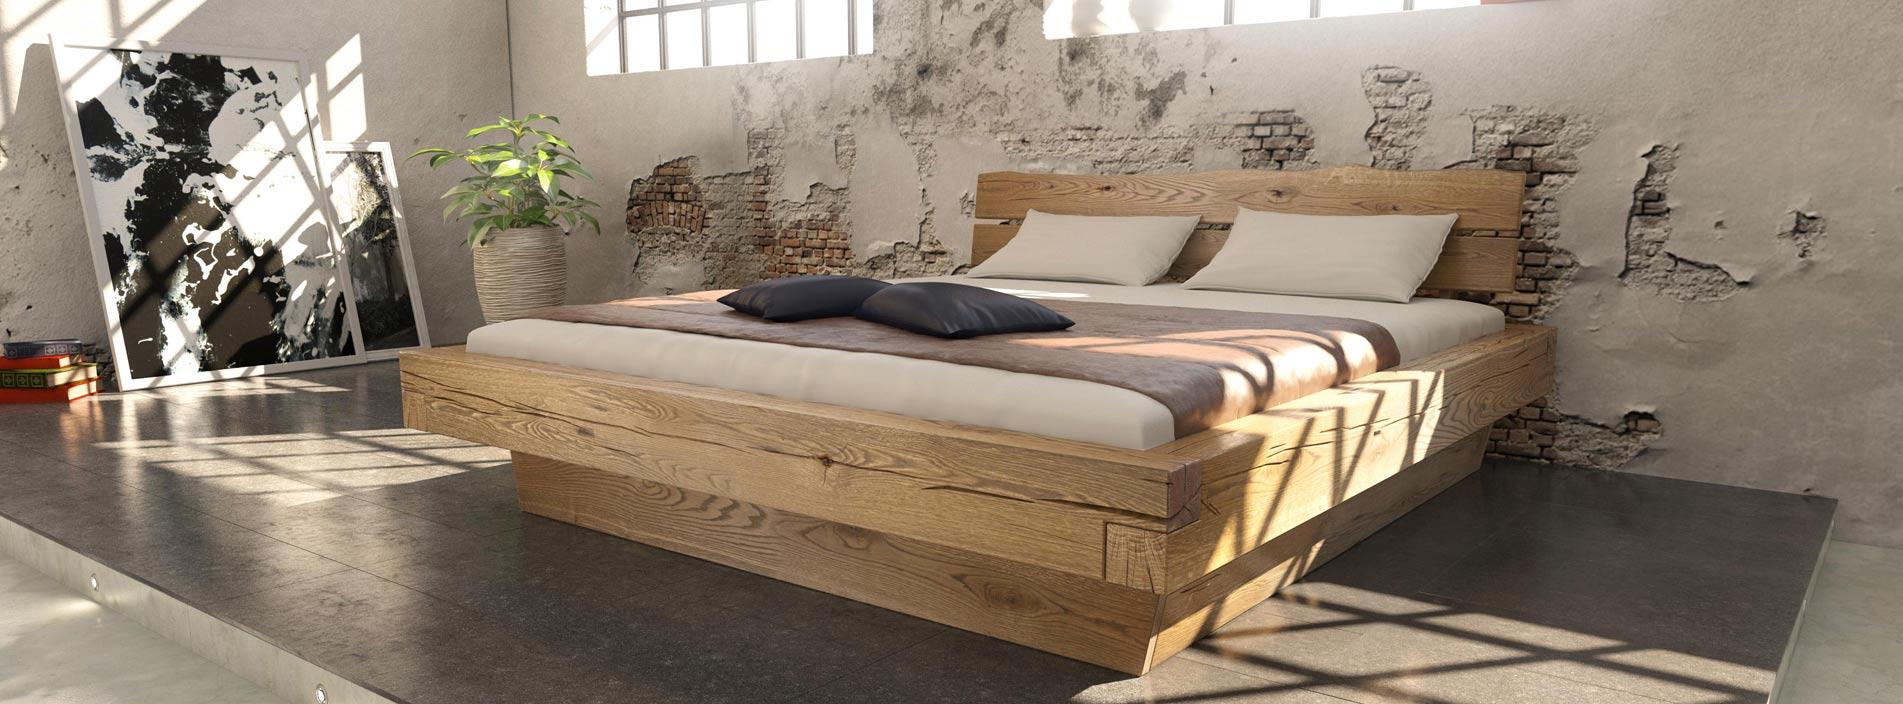 Full Size of Betten Massivholz Münster Mädchen Runde Weiß Ruf Preise Holz Massivholzküche Günstig Kaufen 180x200 überlänge Jabo Bett Betten Massivholz